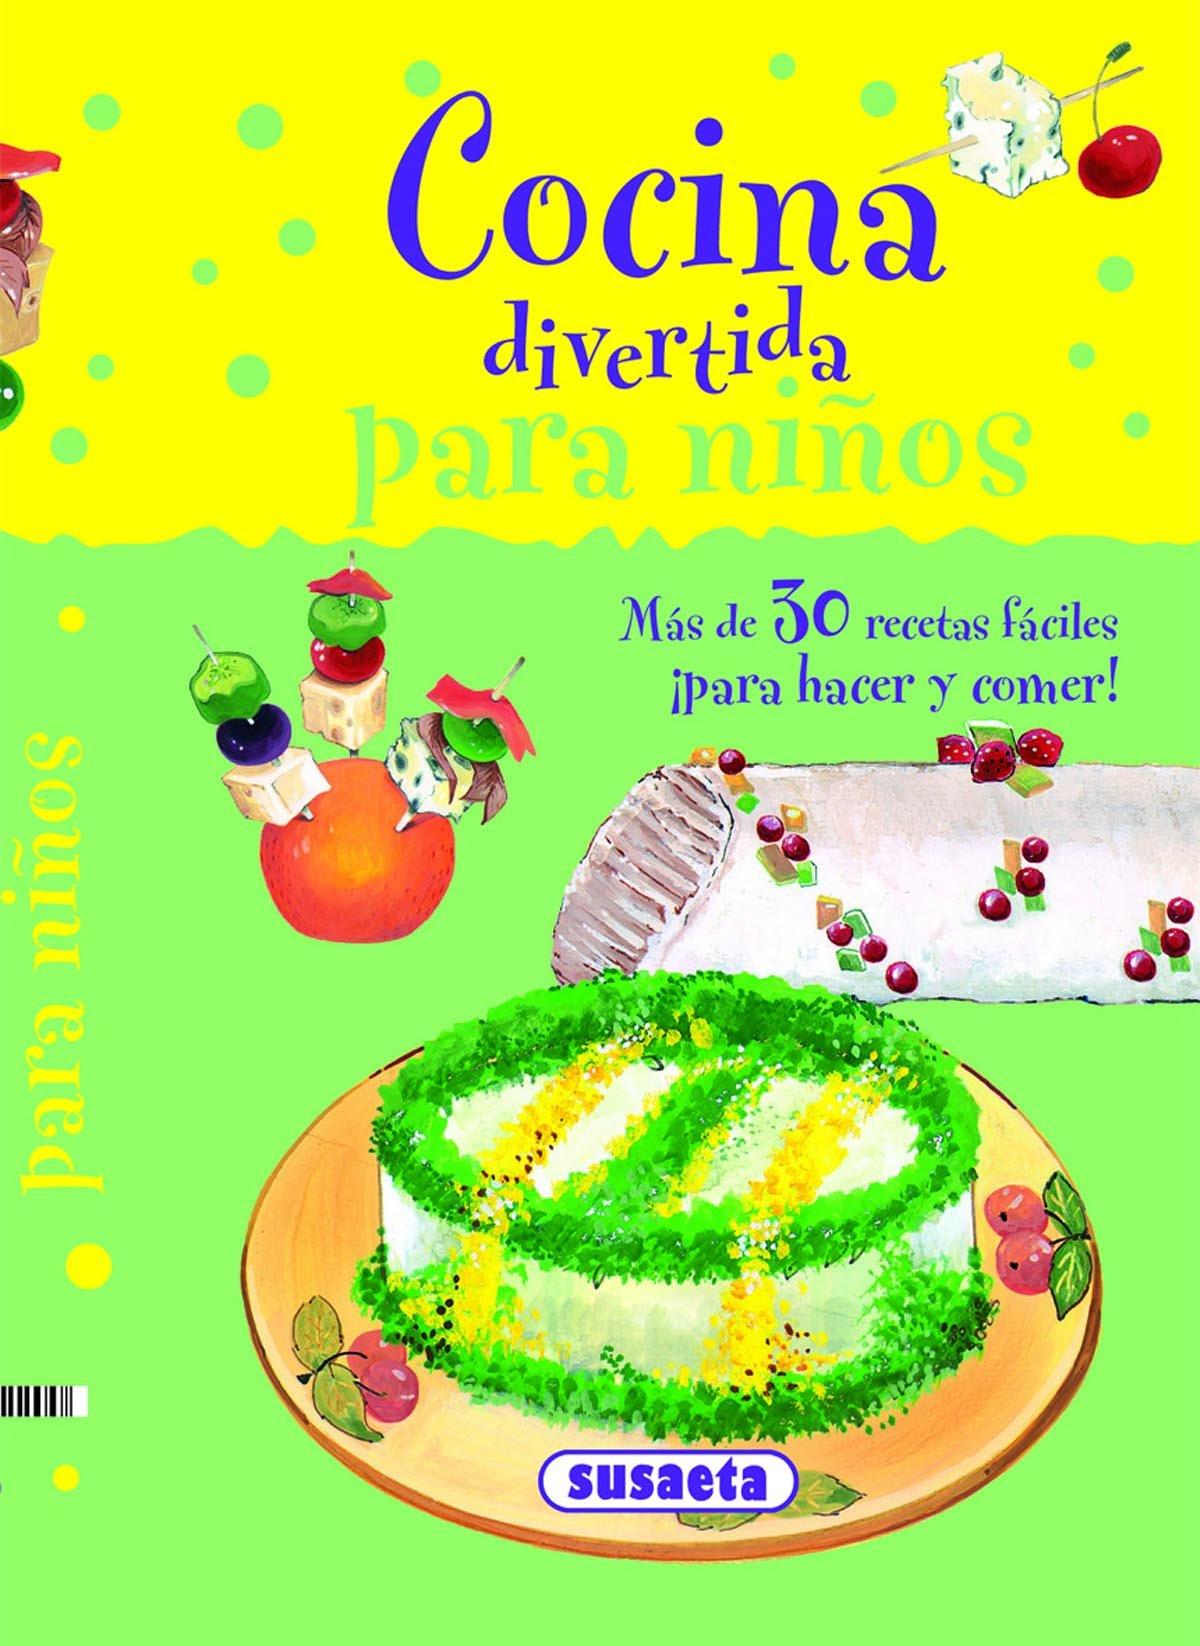 Bonito libros de cocina para ni os galer a de im genes for Cocina divertida para ninos